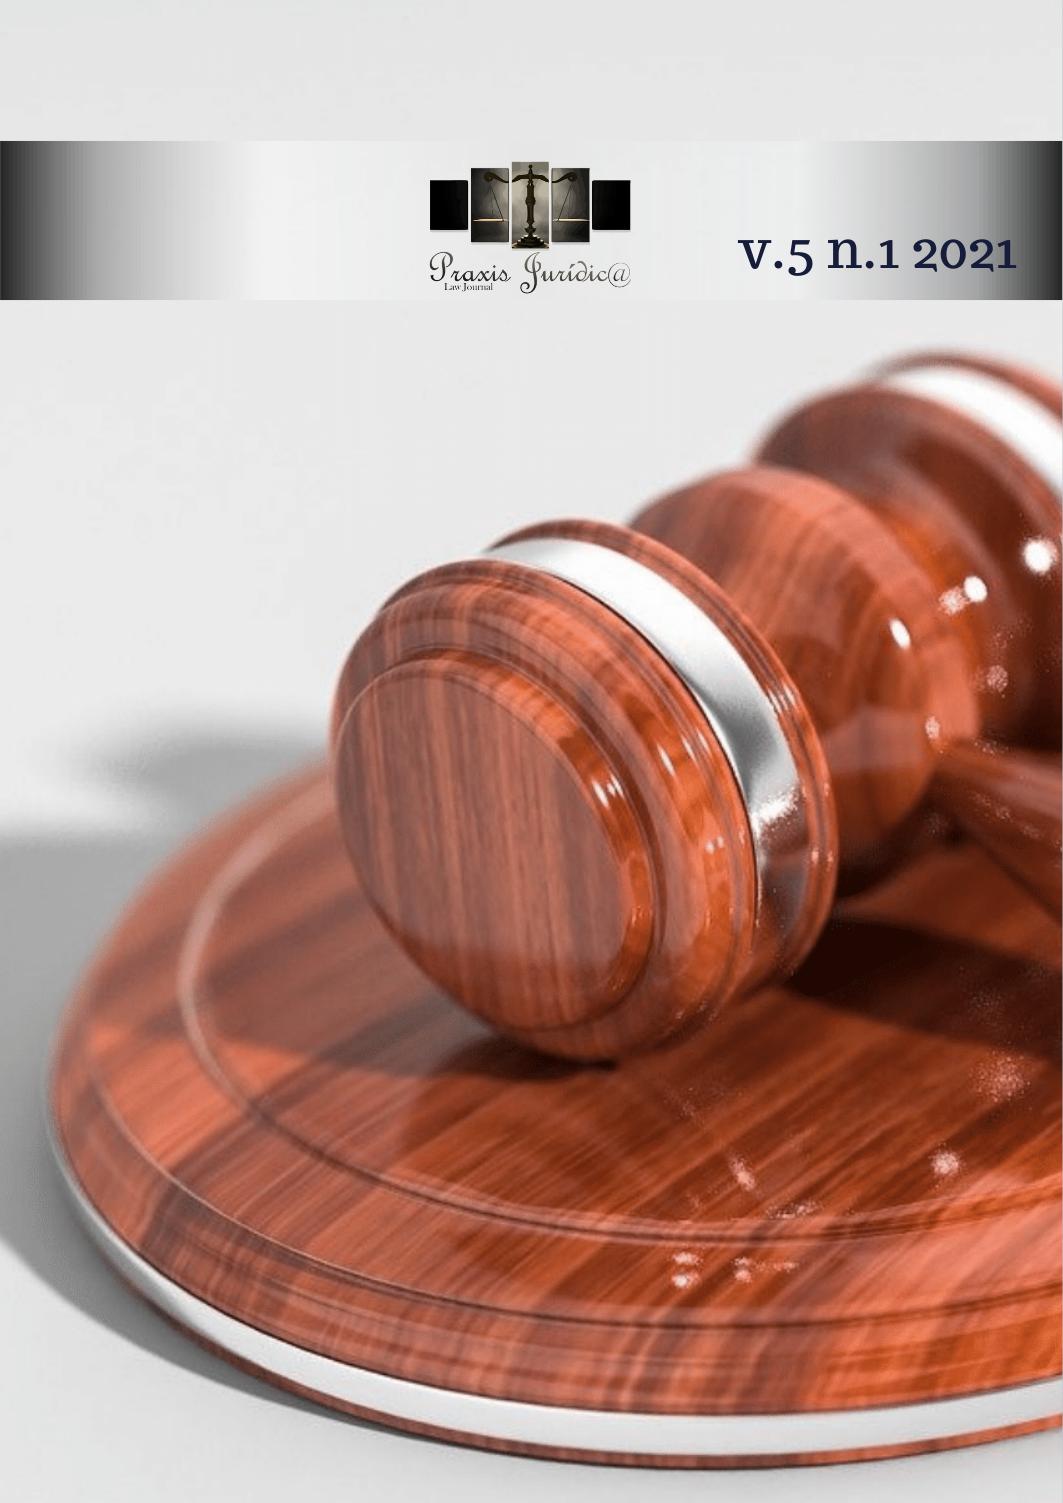 Visualizar v. 5 n. 1 (2021): Praxis Jurídic@ - Law Journal - ISSN: 2596-2108